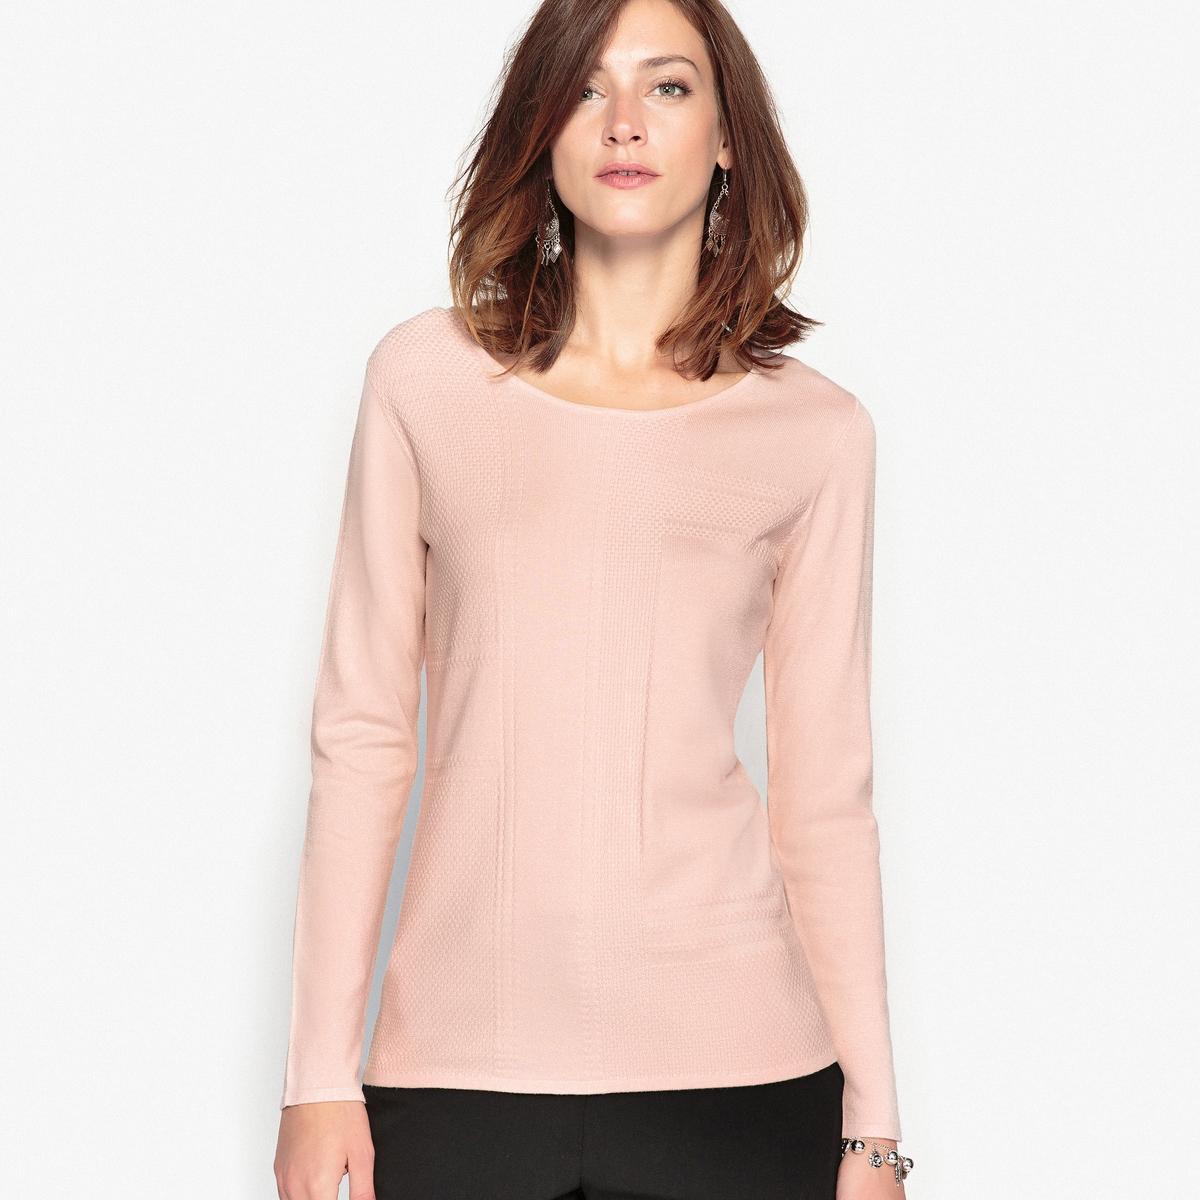 Пуловер из оригинального трикотажа кардиган из оригинального трикотажа 100